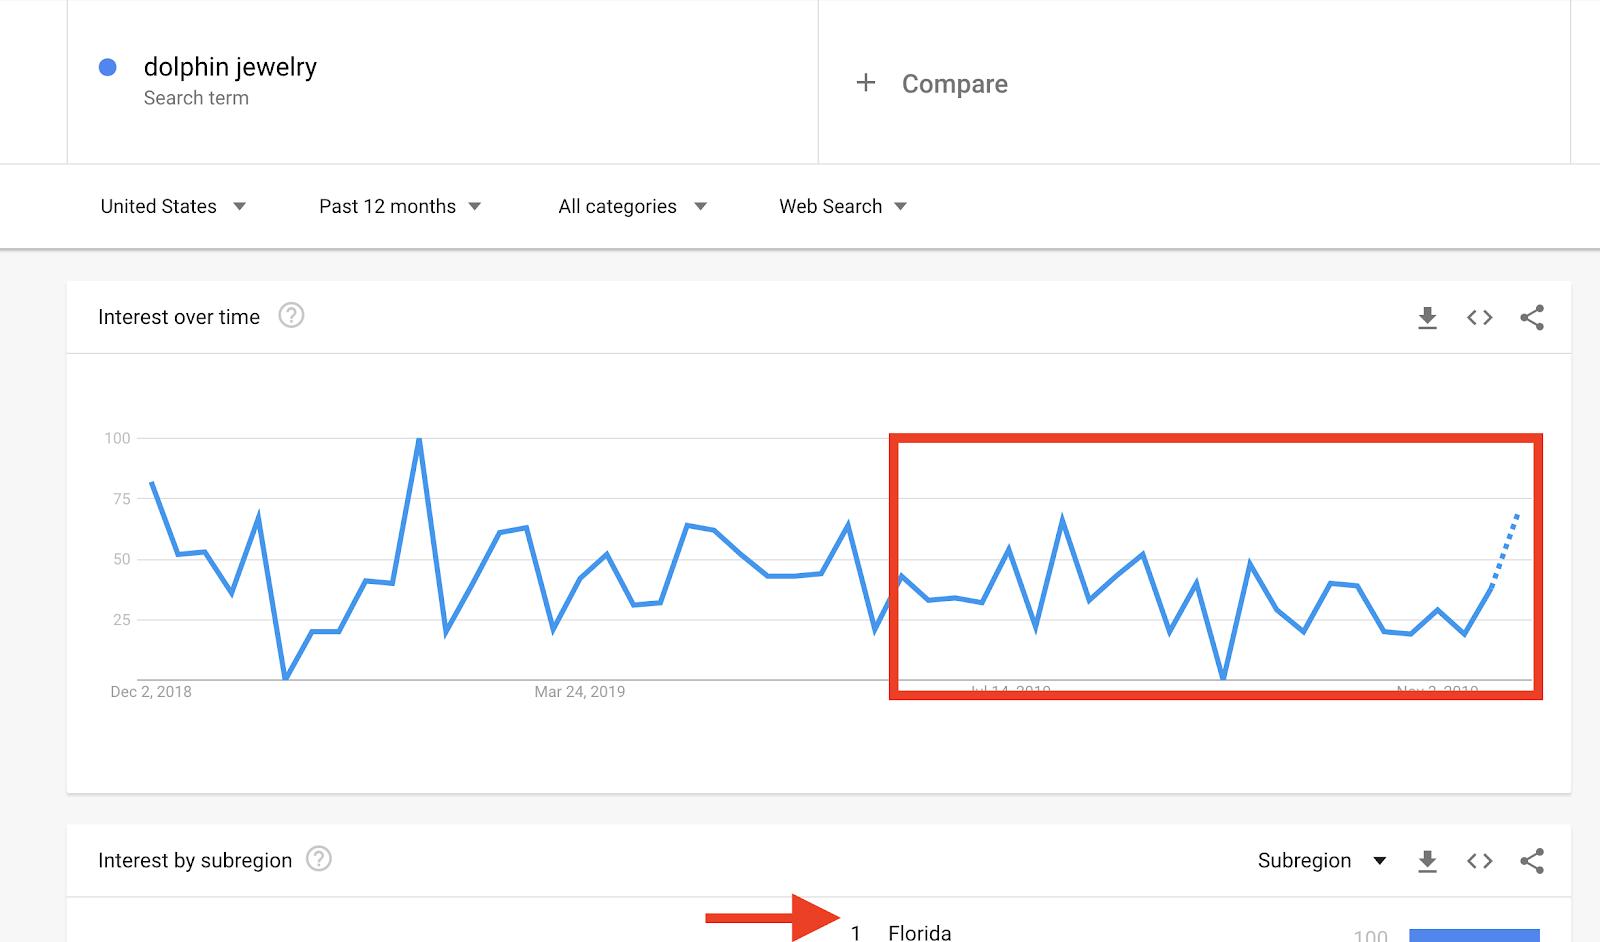 google trend dolphin jewelry